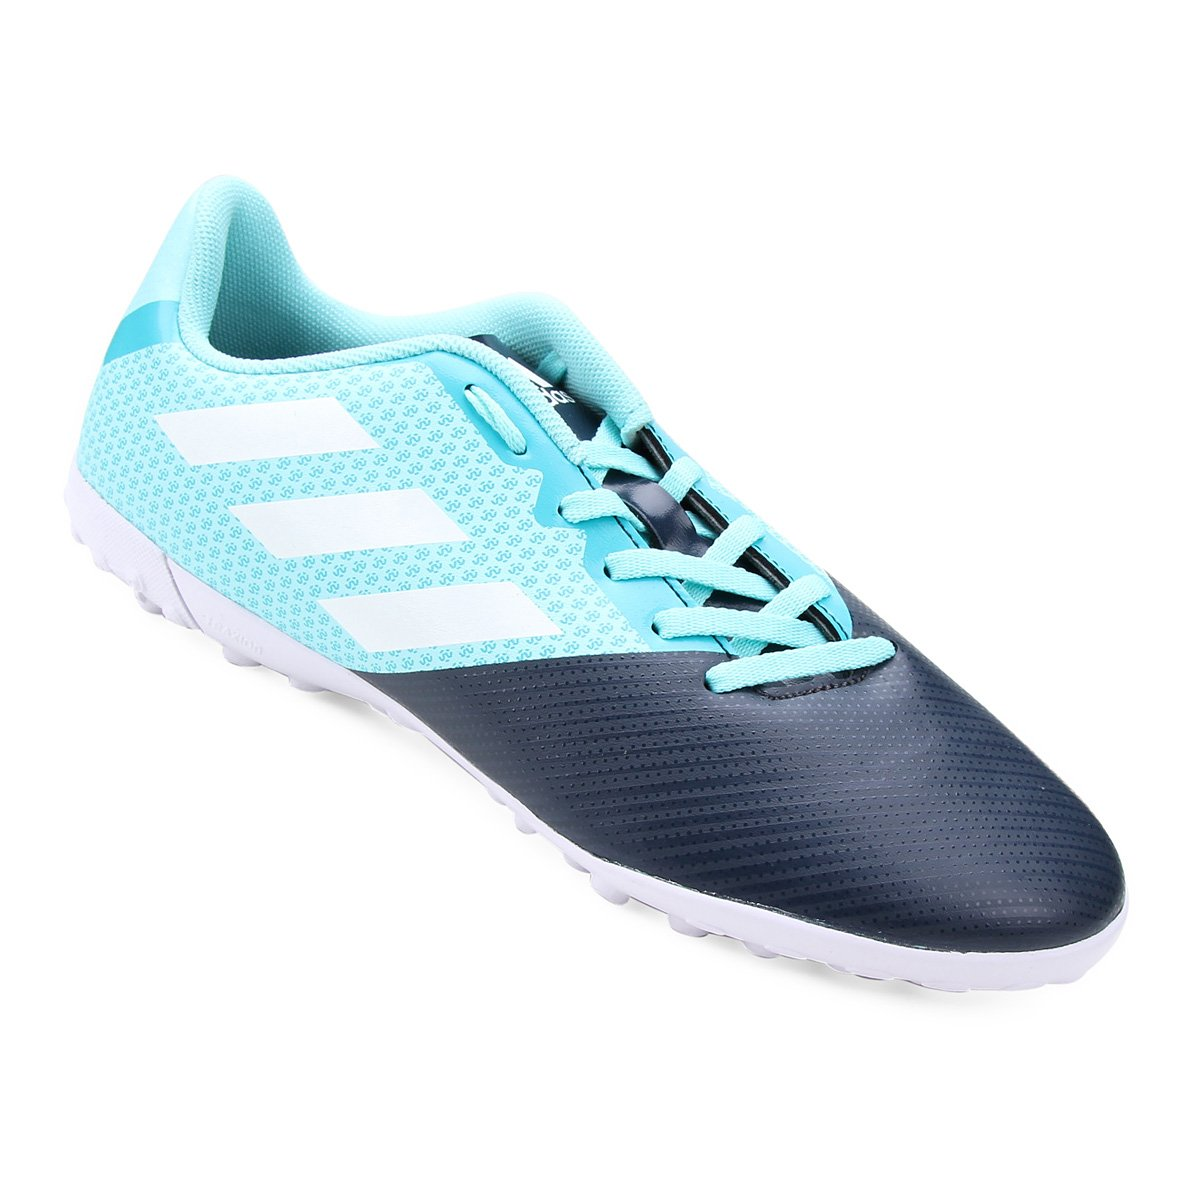 00b949809c Chuteira Society Adidas Artilheira 17 TF